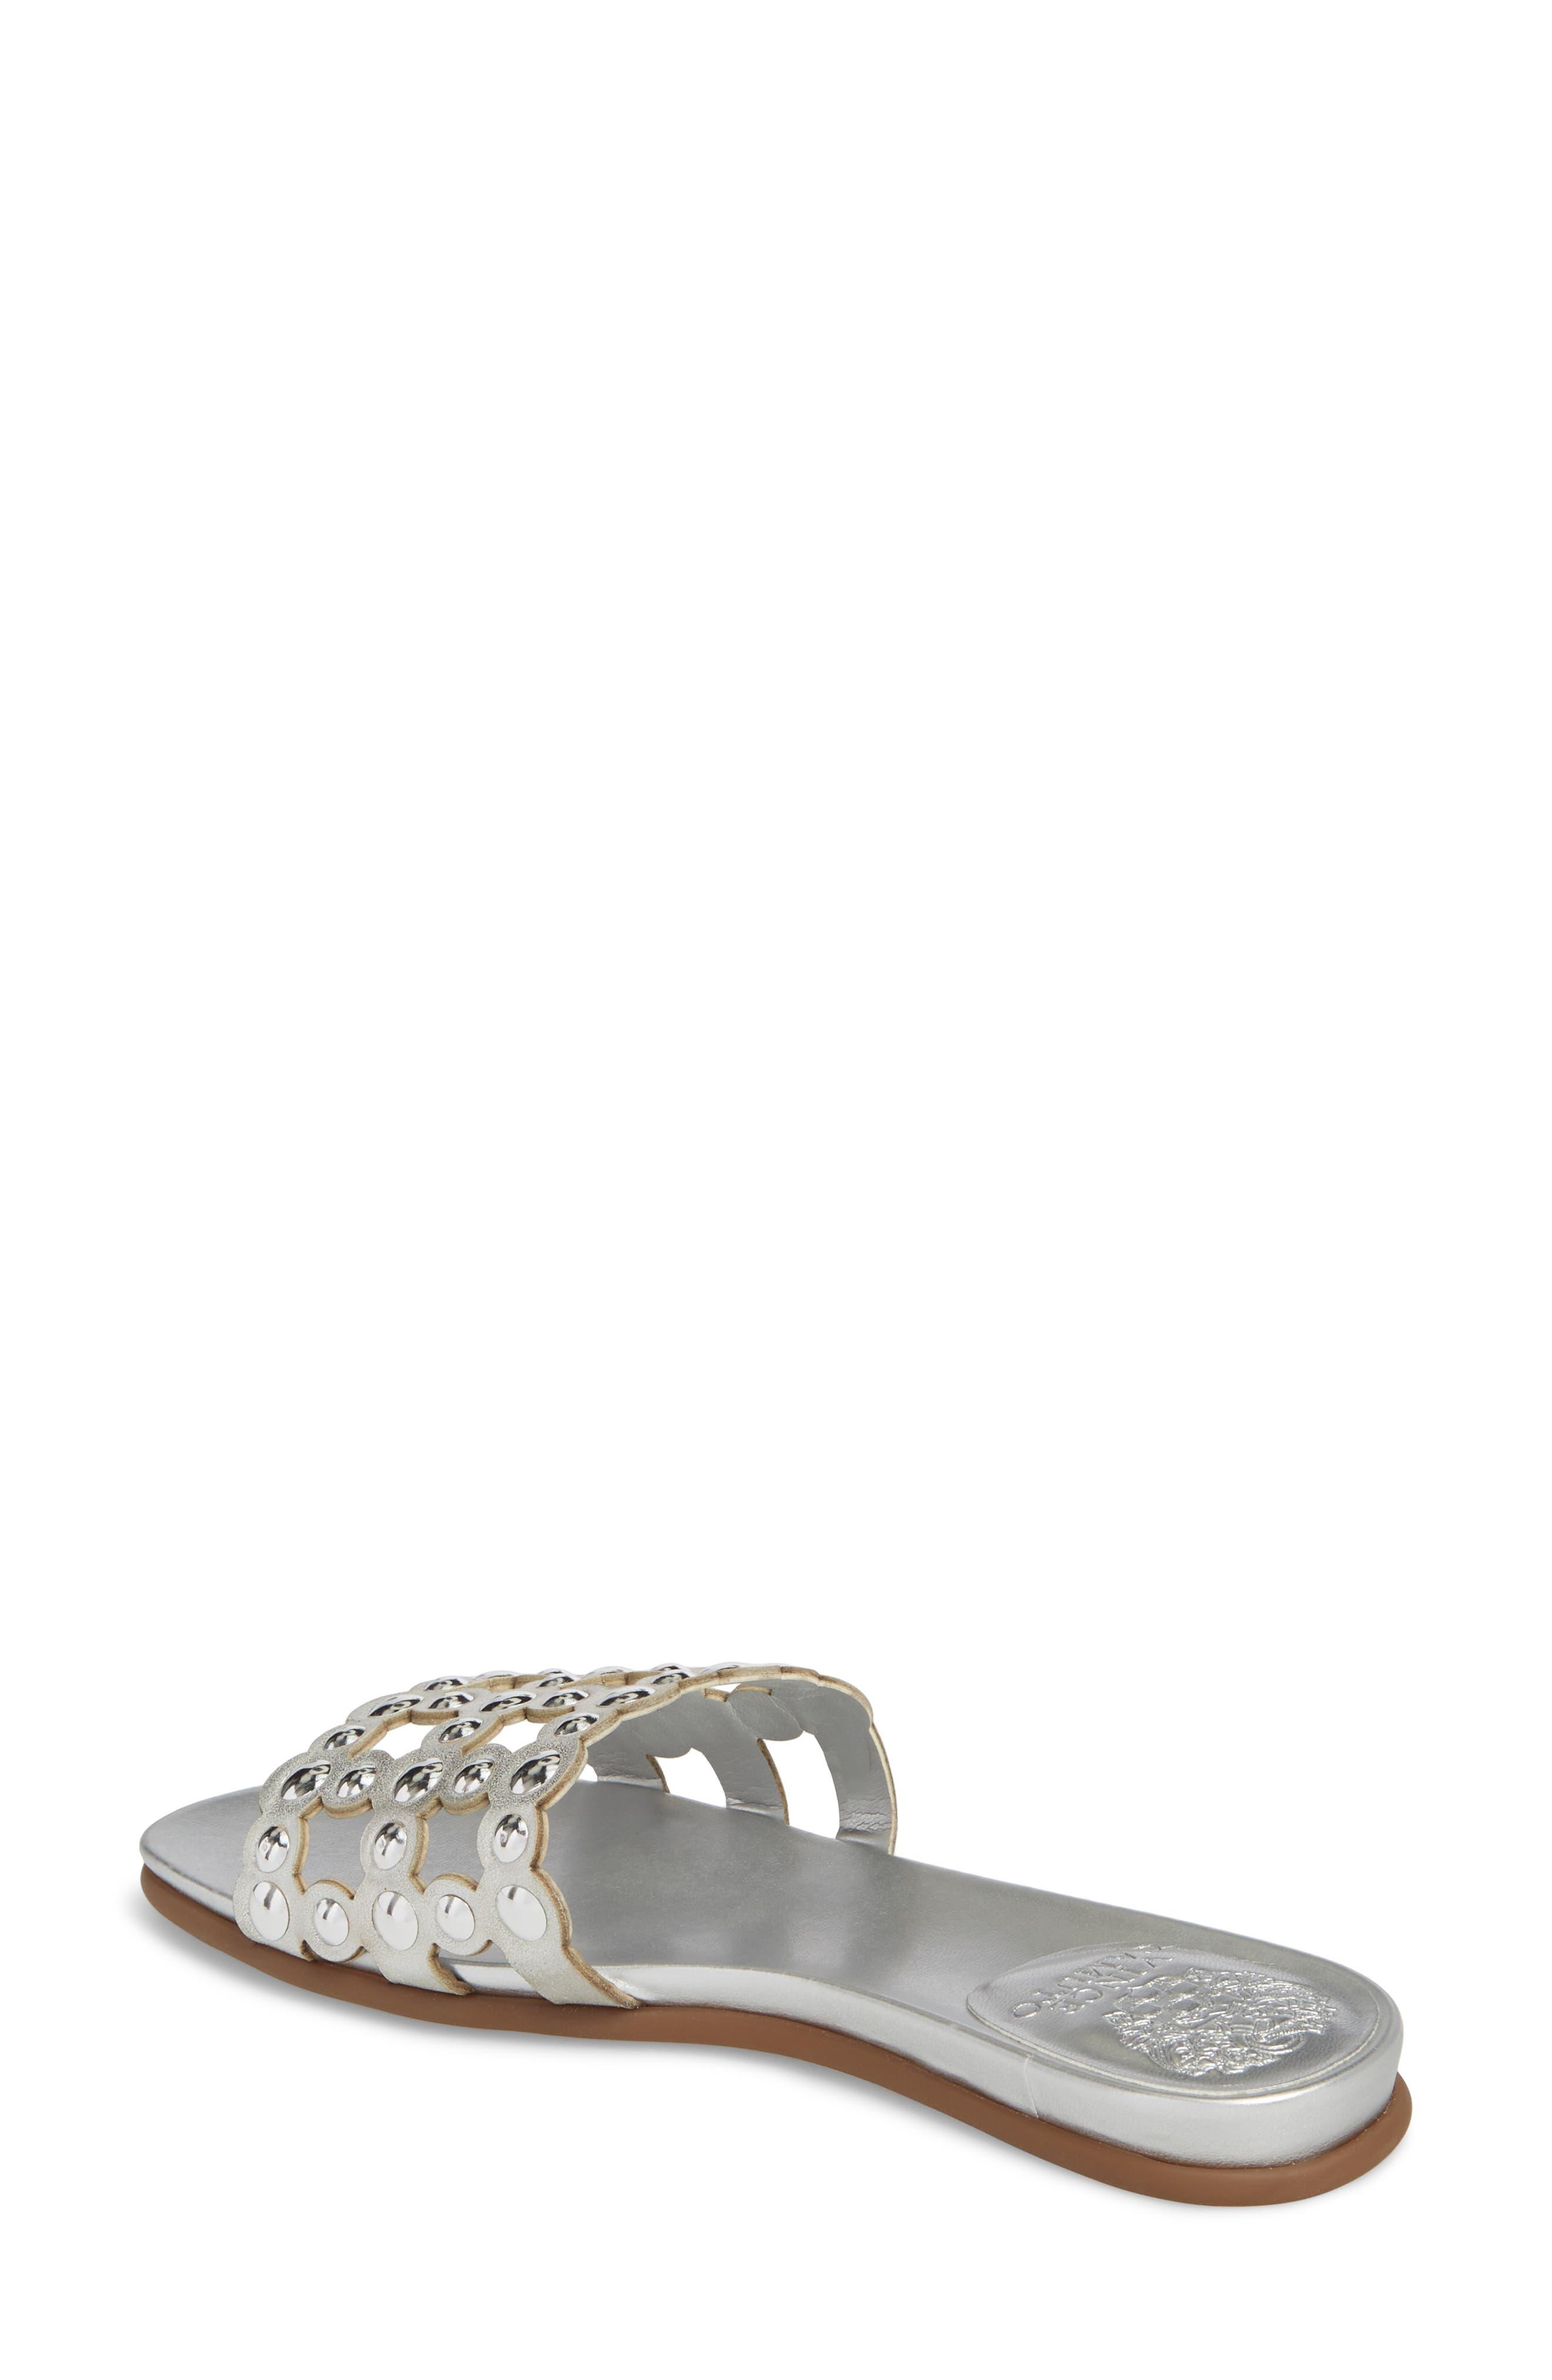 Ellanna Studded Slide Sandal,                             Alternate thumbnail 2, color,                             GLEAMING SILVER LEATHER